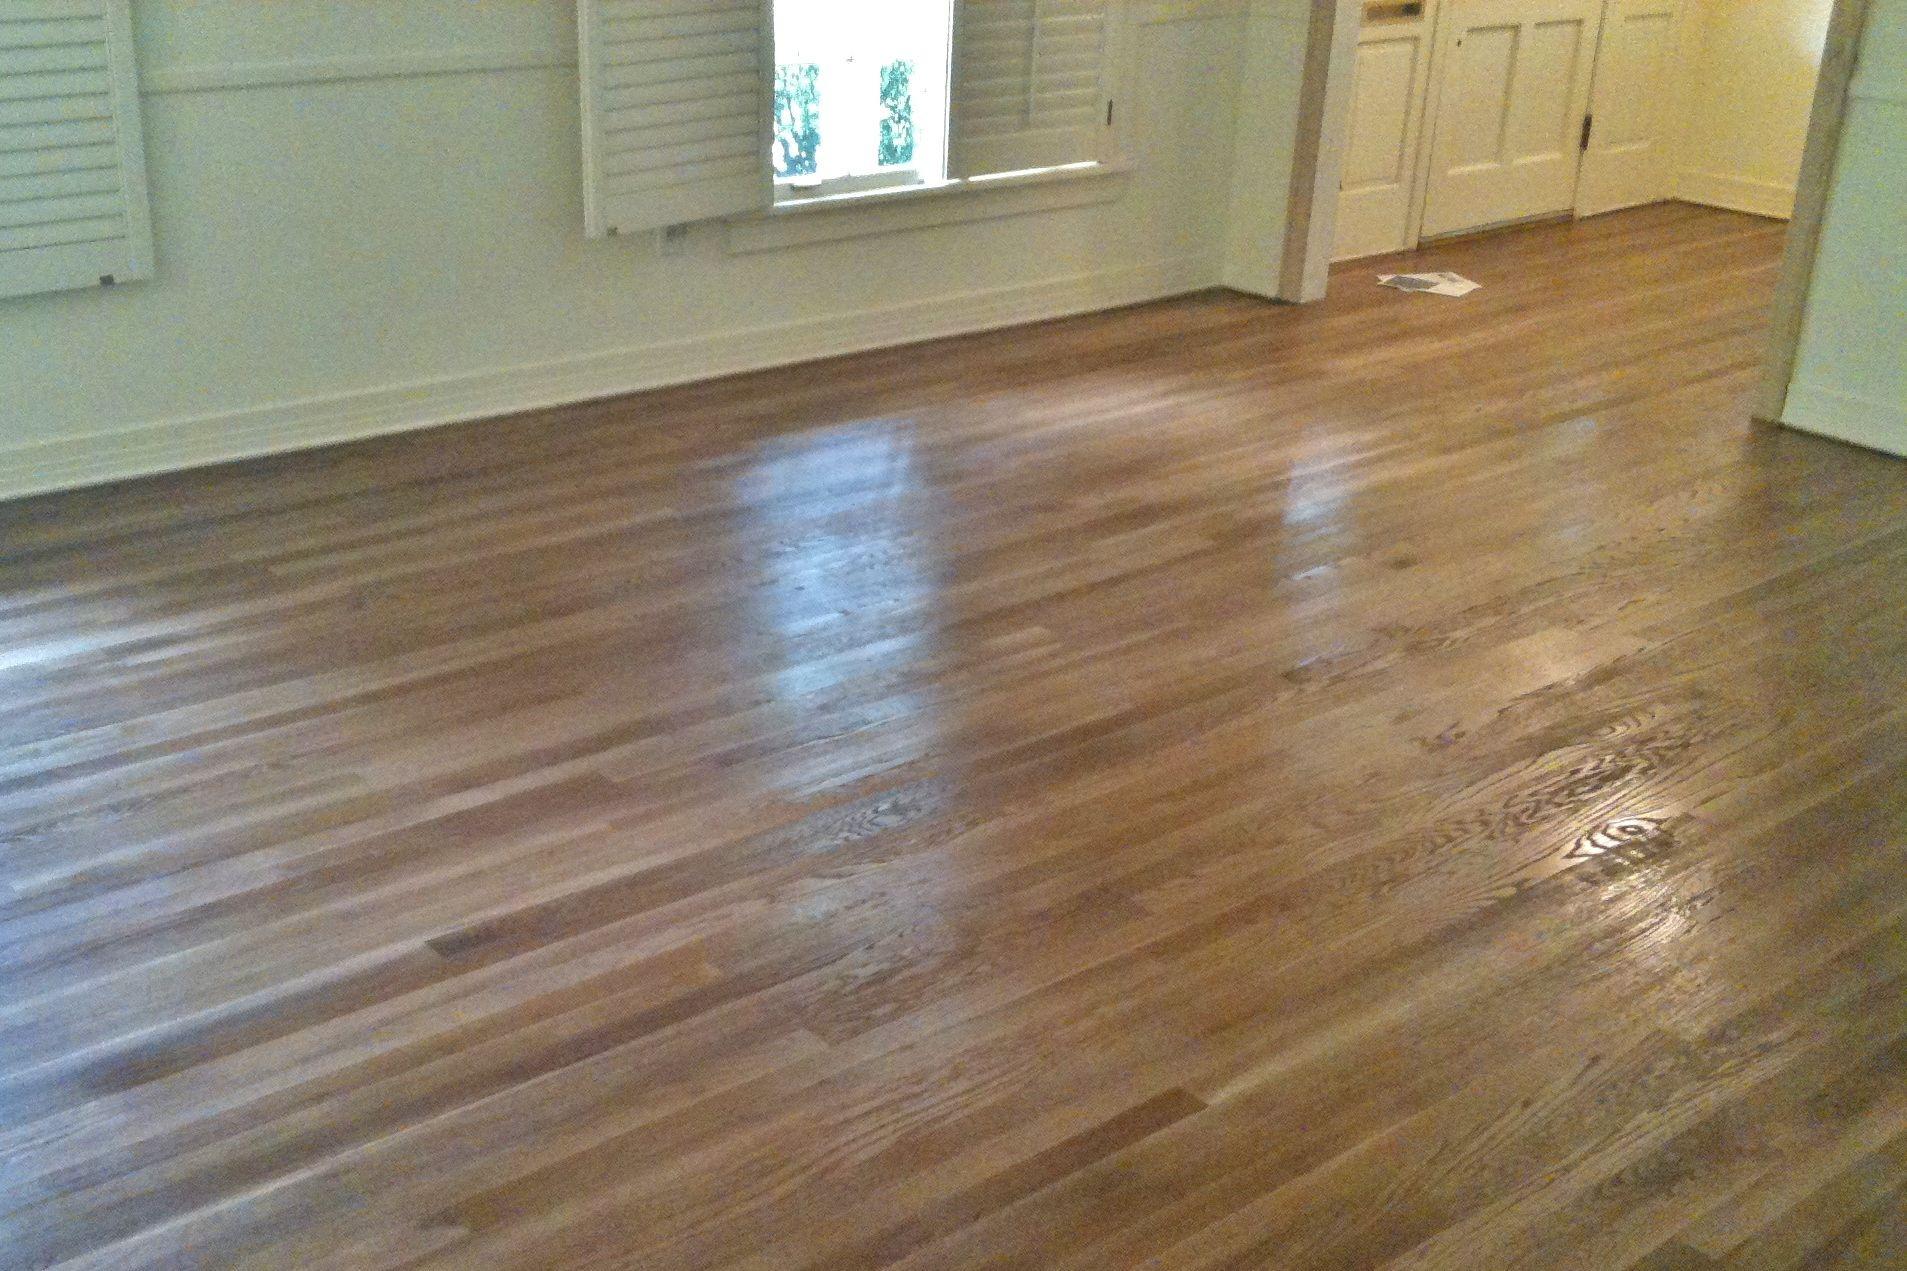 solid hardwood floor underlayment options of oak meet special walnut home design pinterest flooring for minwax special walnut stain on oak hardwood floors